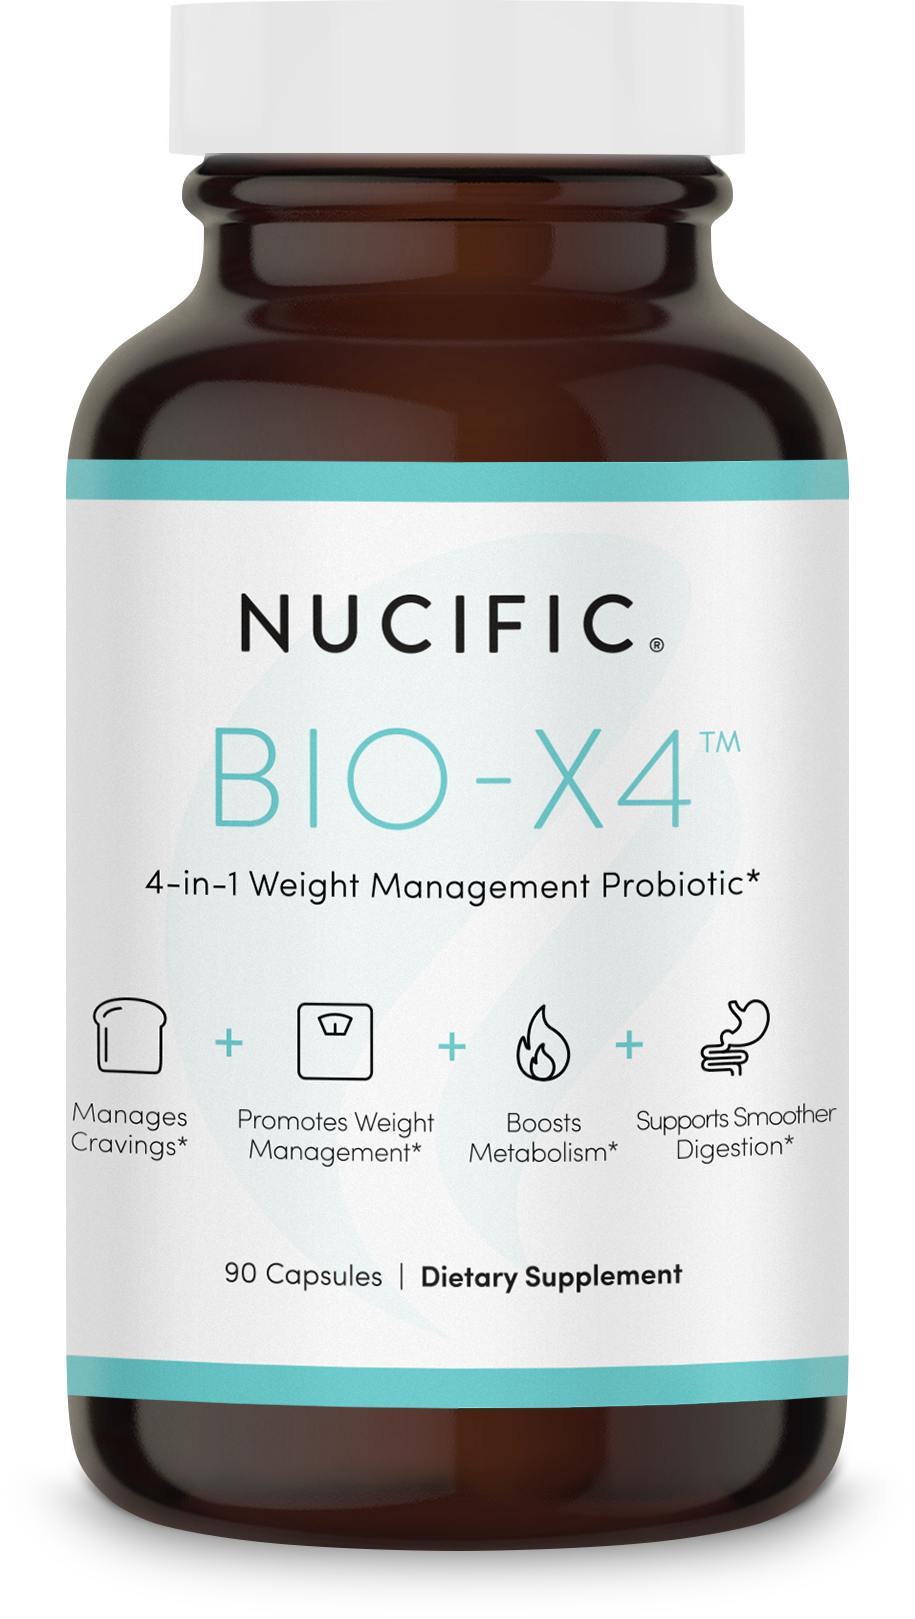 bio-x4 product